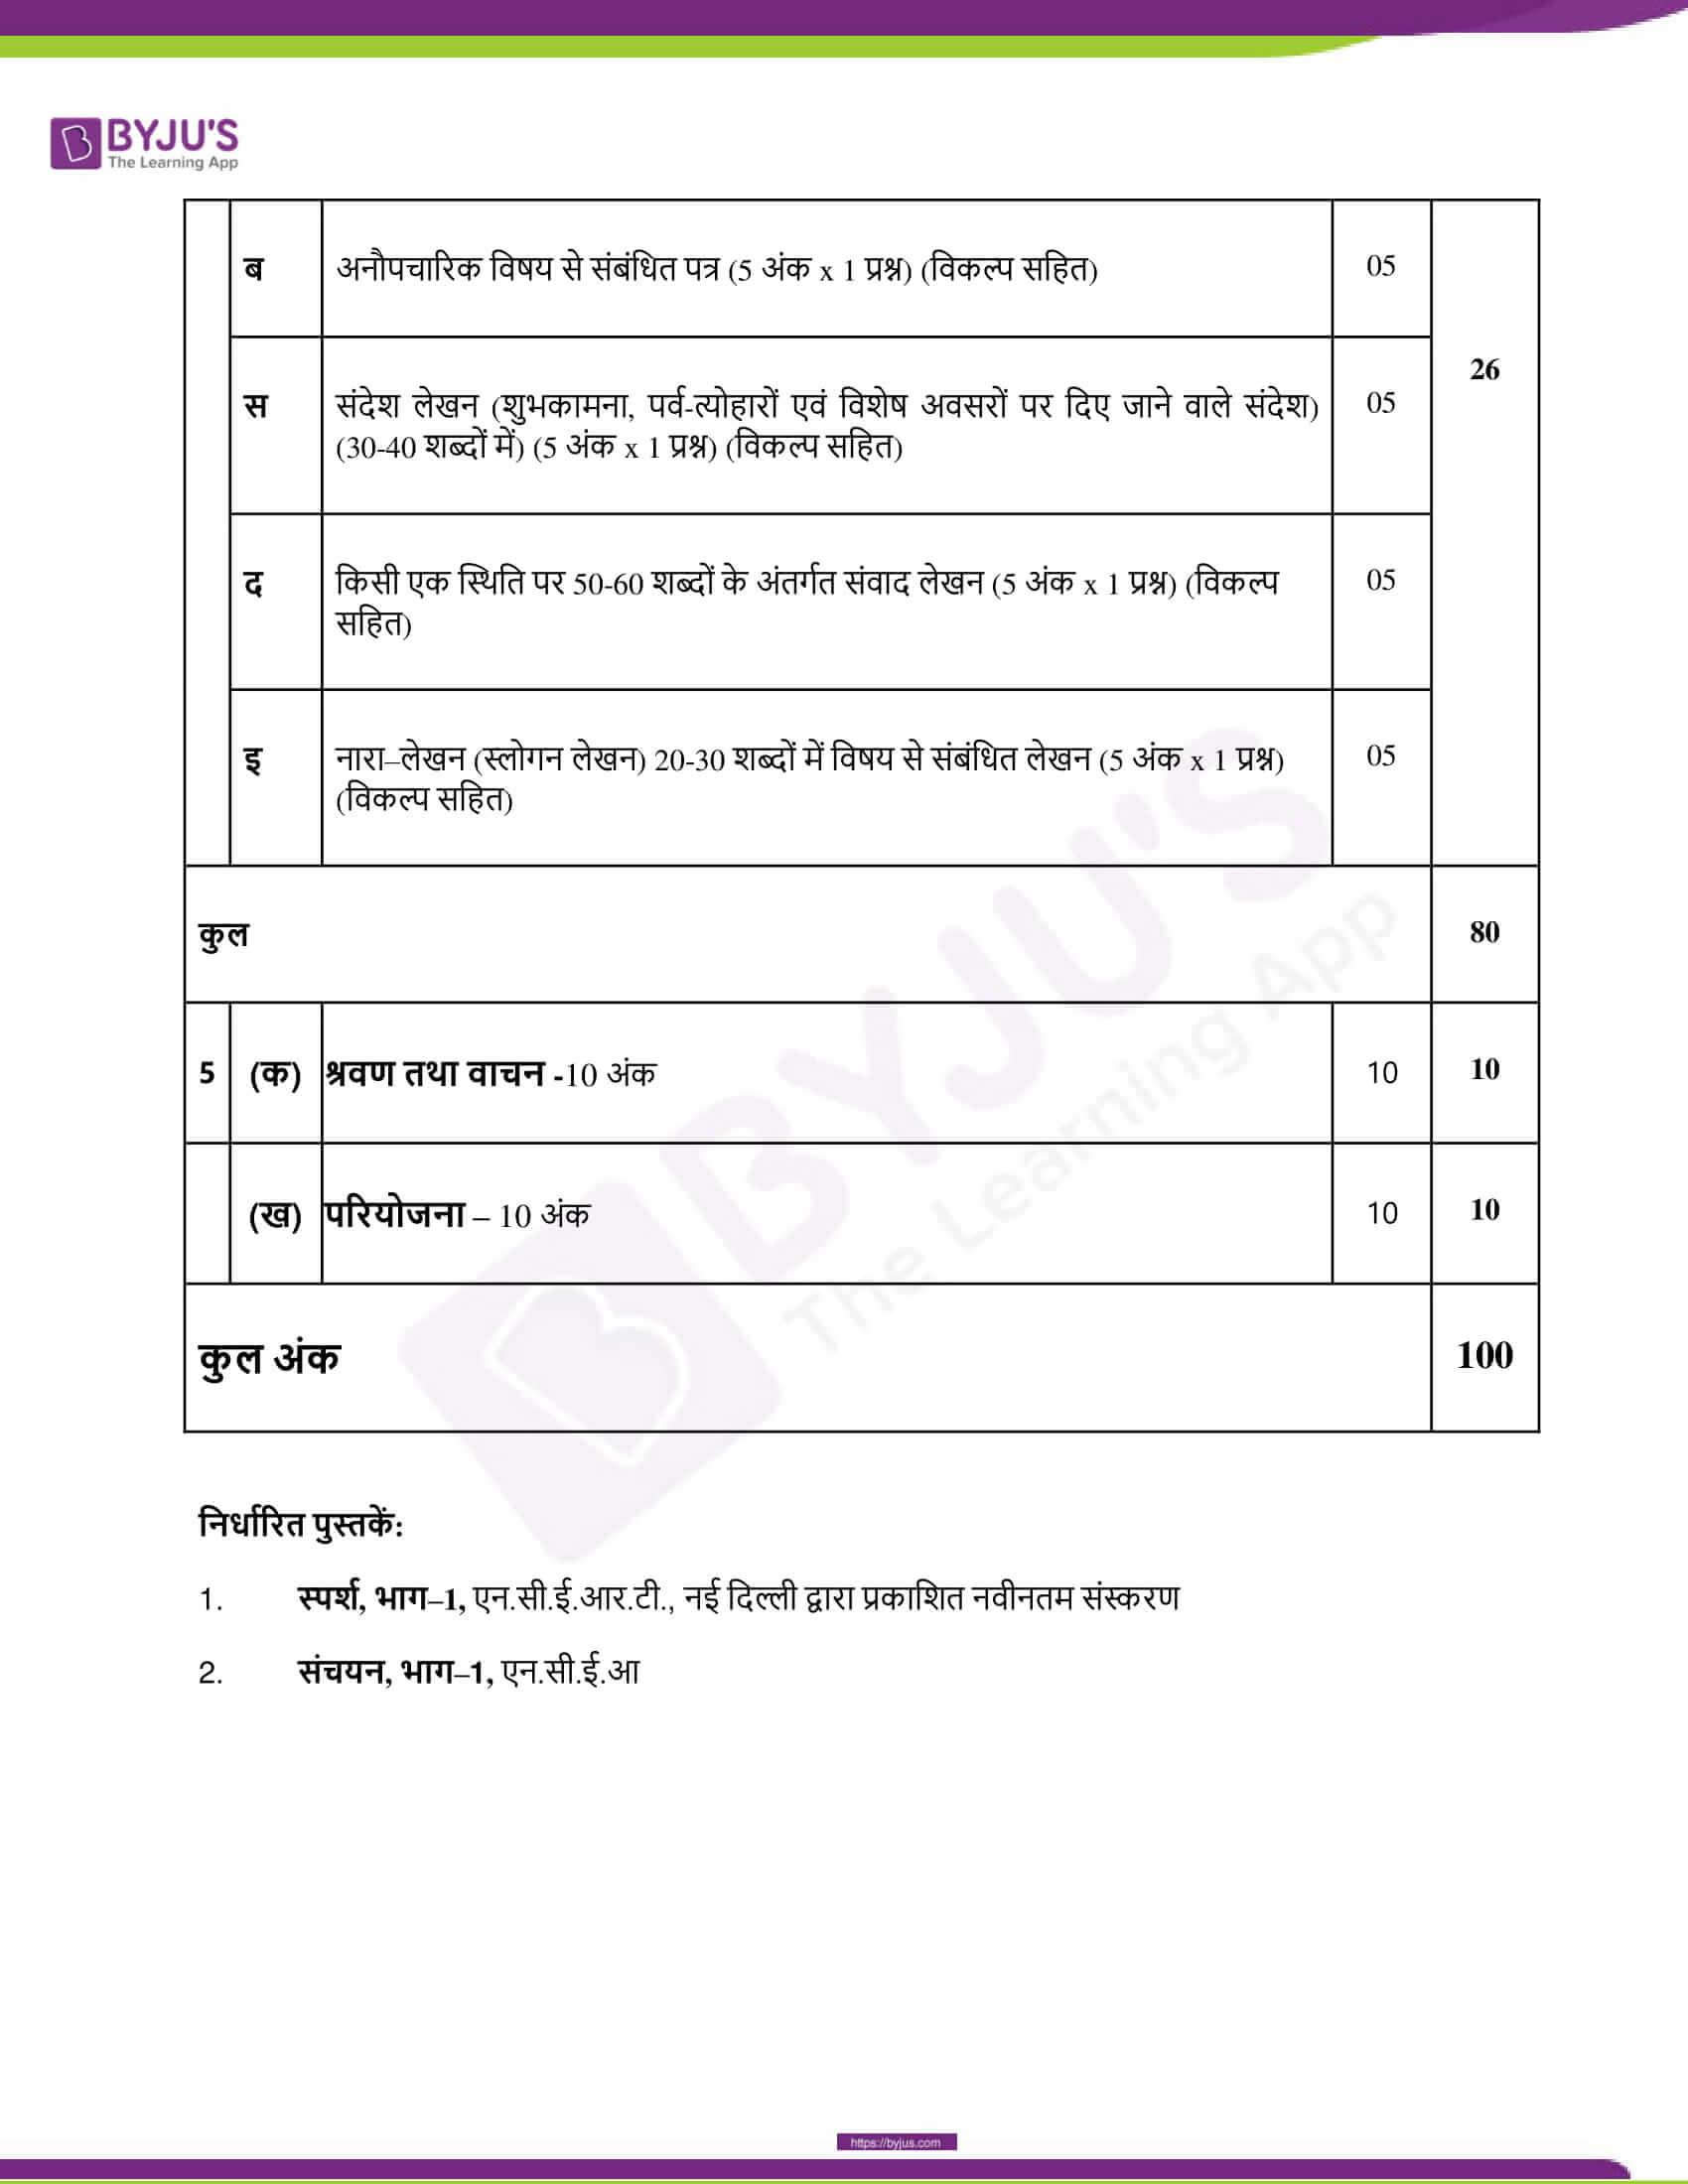 CBSE Class 10 Hindi Course B Revised Syllabus 2020 21 10